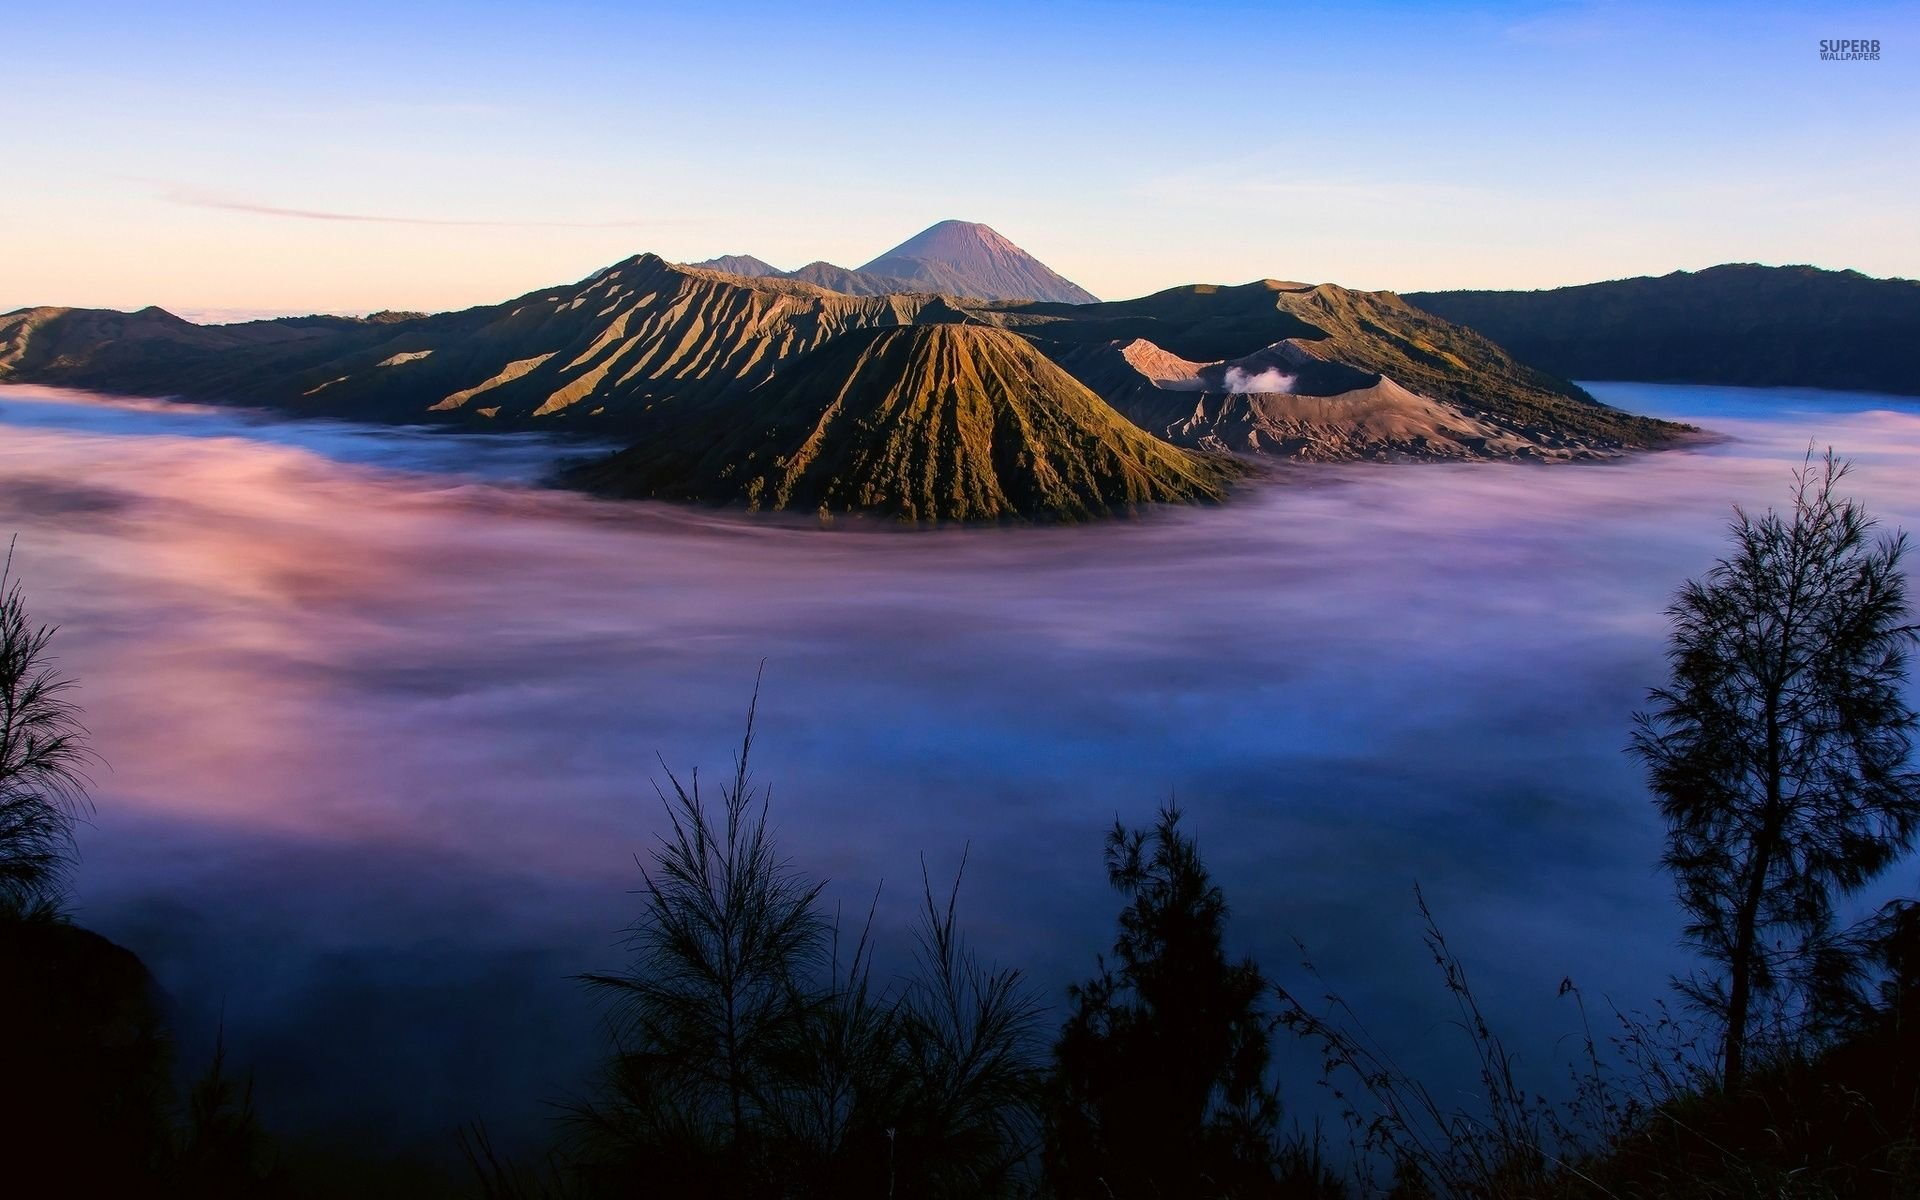 HD Wallpaper Hd Gunung Bromo | Download Kumpulan Wallpaper ...